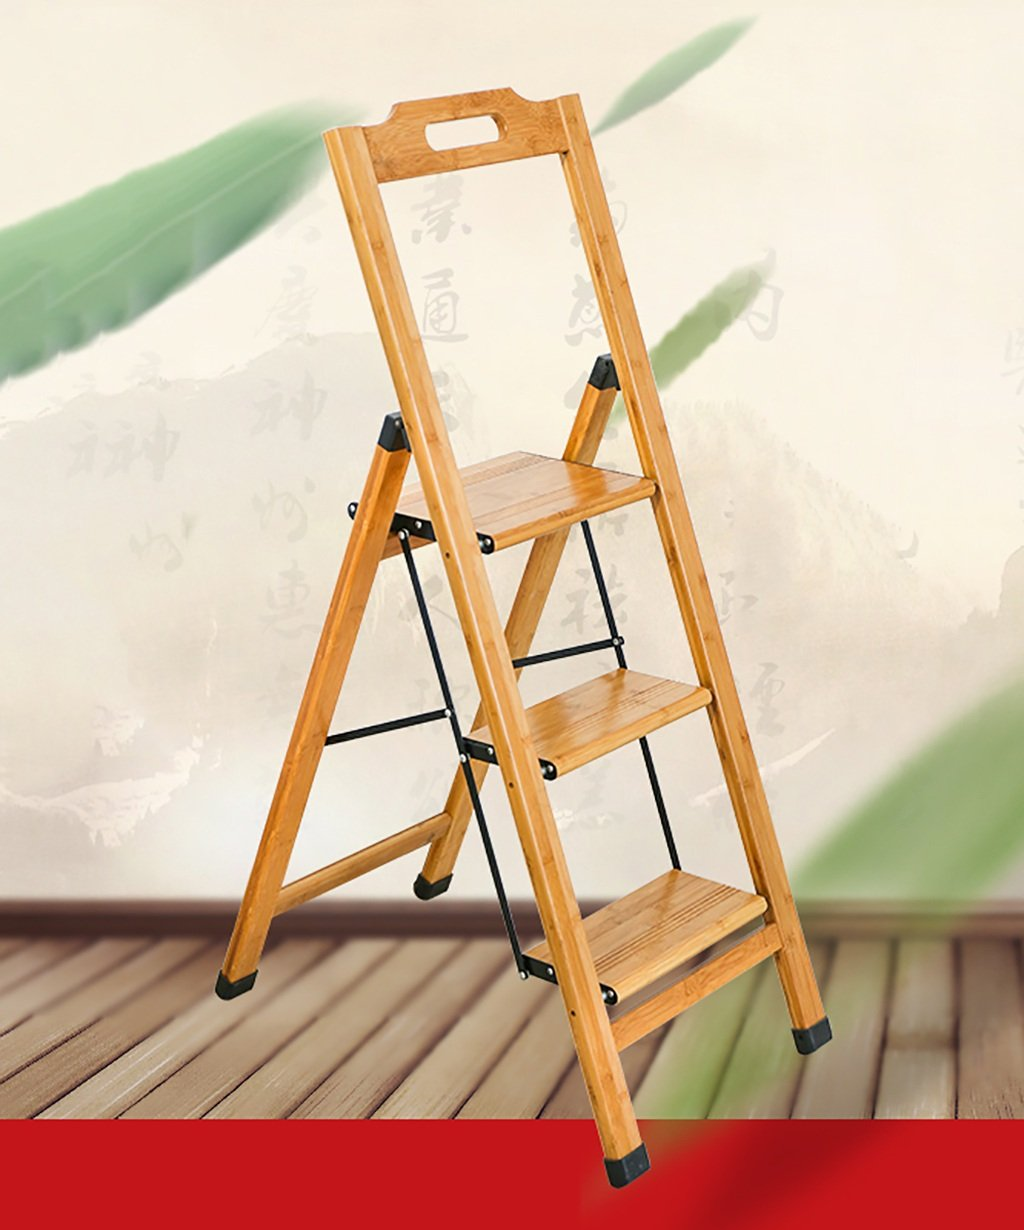 PENGYIZI Madera Maciza Escalera Plegable Casa Creative Multi-Funcional Bambú Escalera Escalera De Silla Escalera Interior: Amazon.es: Hogar